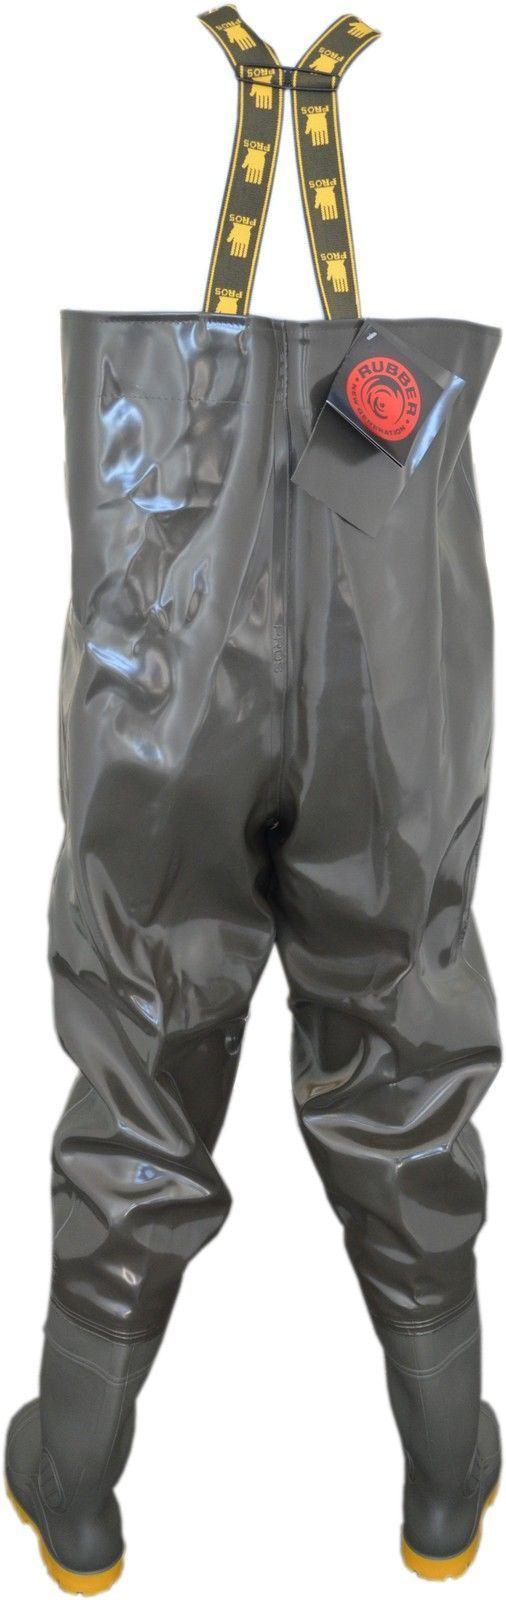 Strong Strong Strong olive PESCATORE Pantaloni impermeabili, Taglia 40 EU, RUBBER NEW GENERATION stagno Pantaloni 12d798